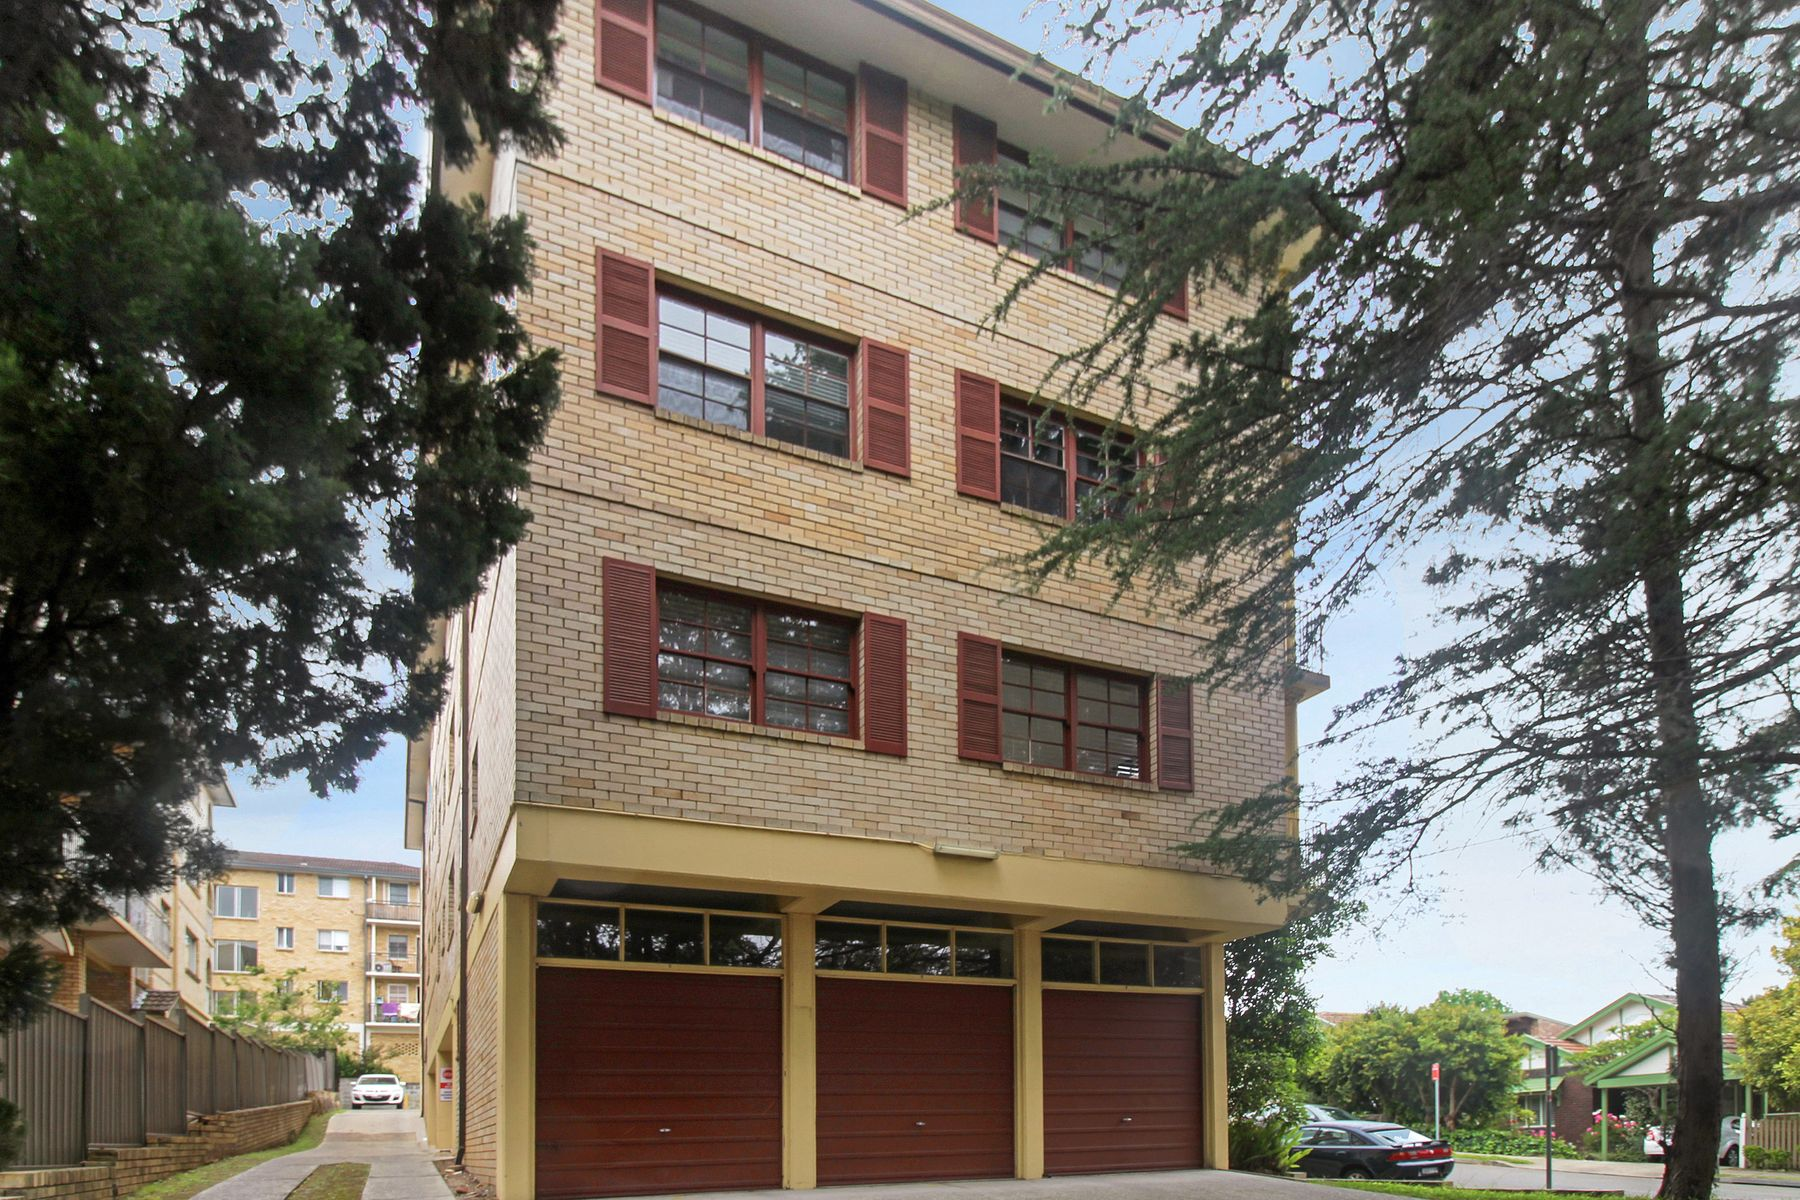 8/14 Pearson Street, Gladesville, NSW 2111